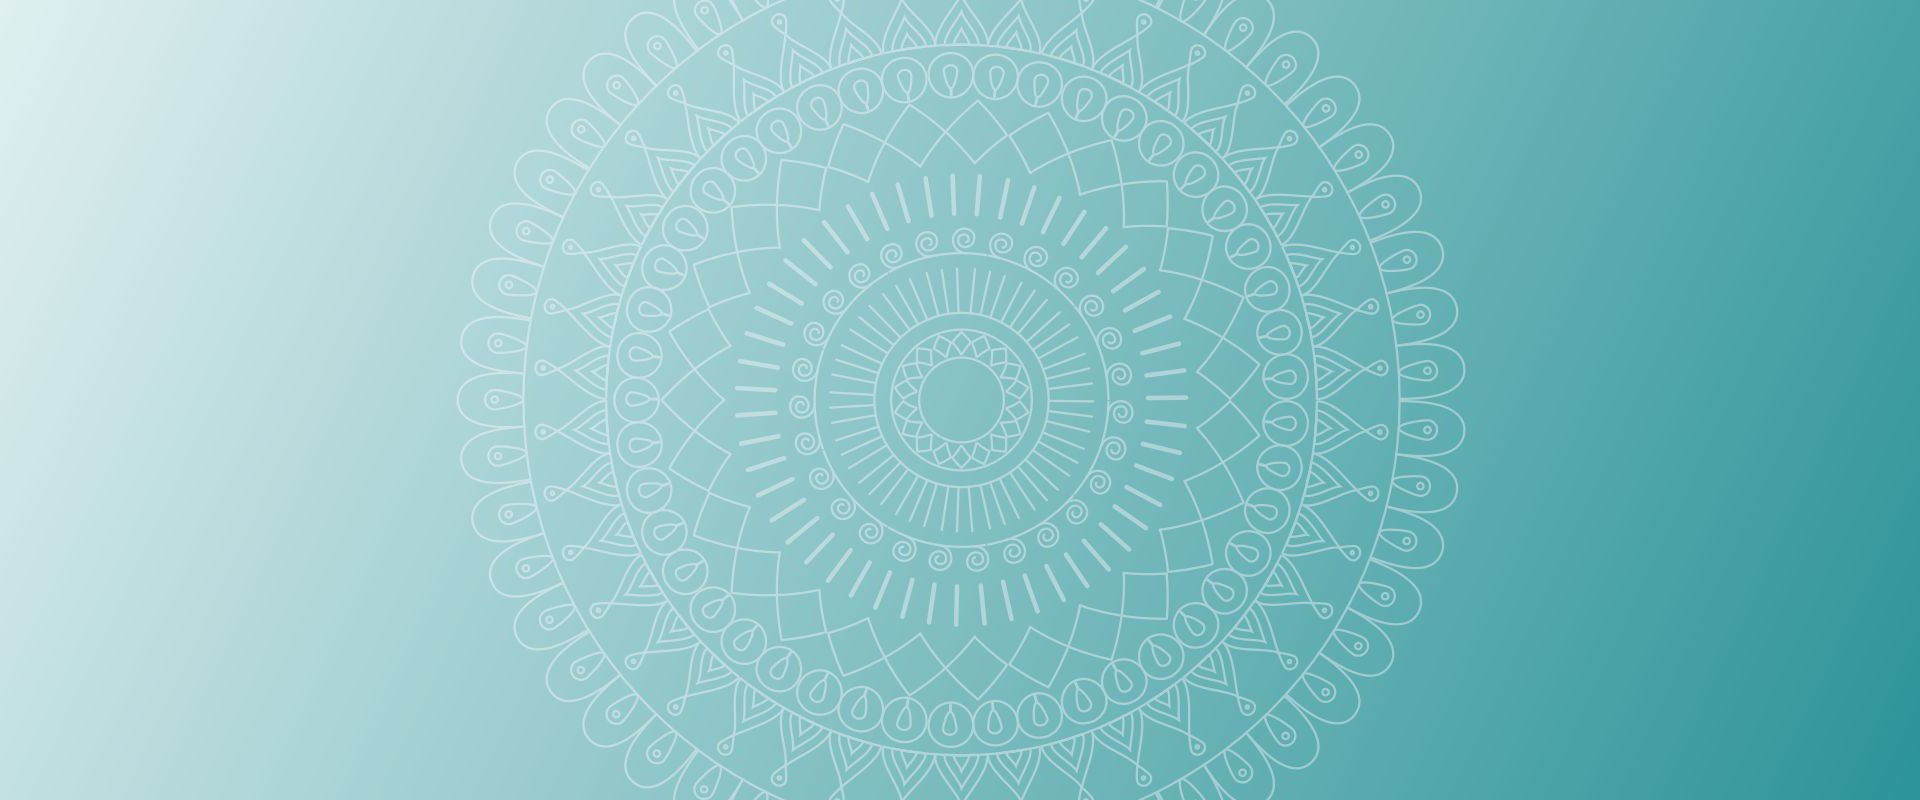 dorit-bull-guestrow-yoga-studio-leistungen-mandala-green